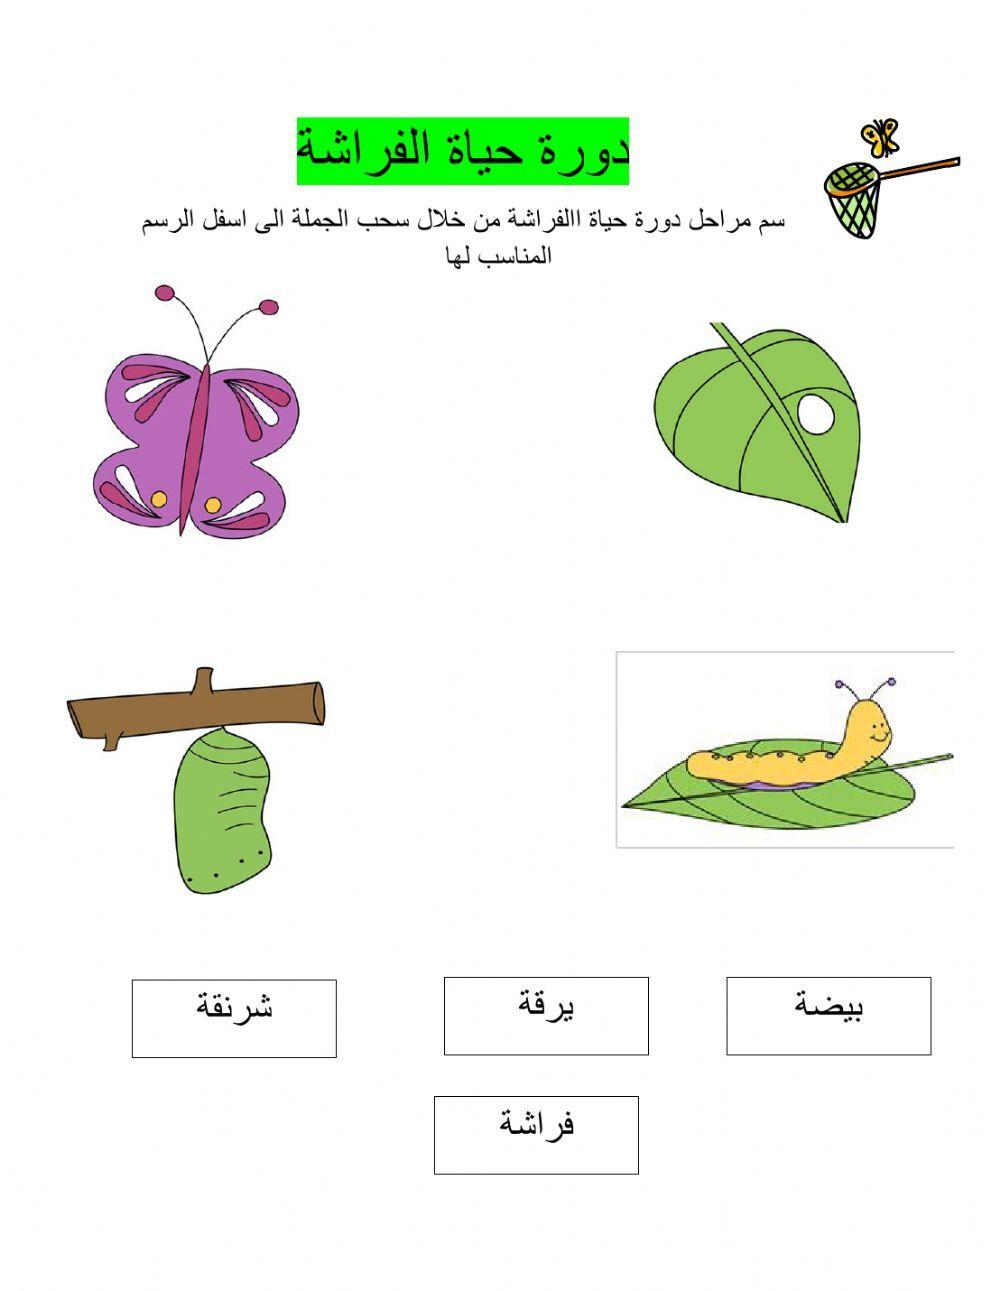 دورات الحياة Online Activity For الصف الثاني You Can Do The Exercises Online Or Download The Worksheet As Pdf Colorful Backgrounds Gift Wrapping Your Teacher